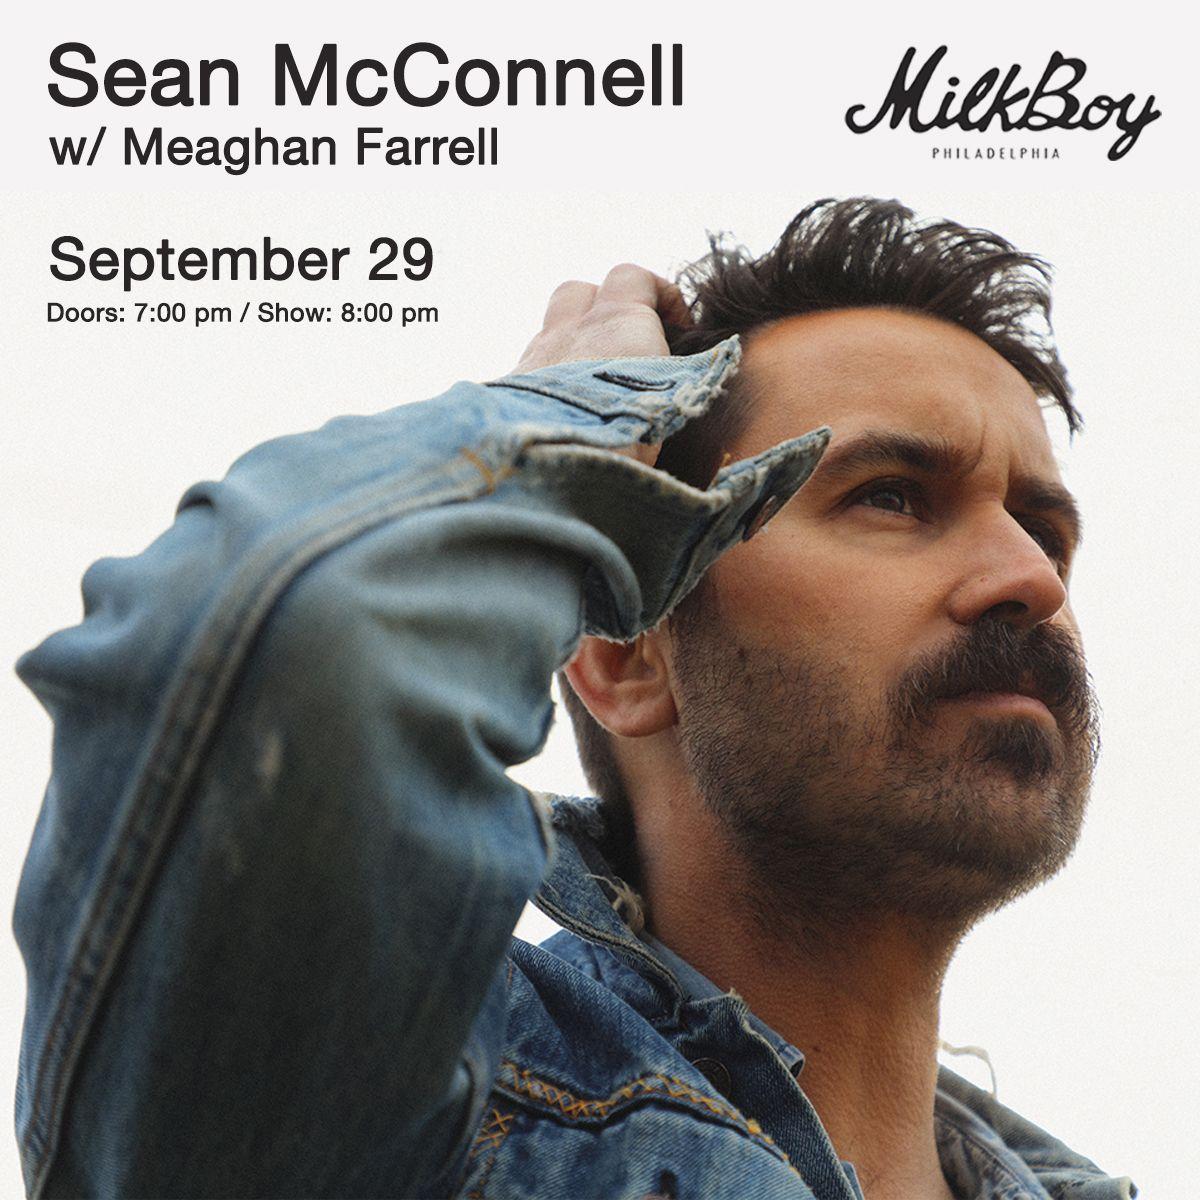 Sean McConnell: